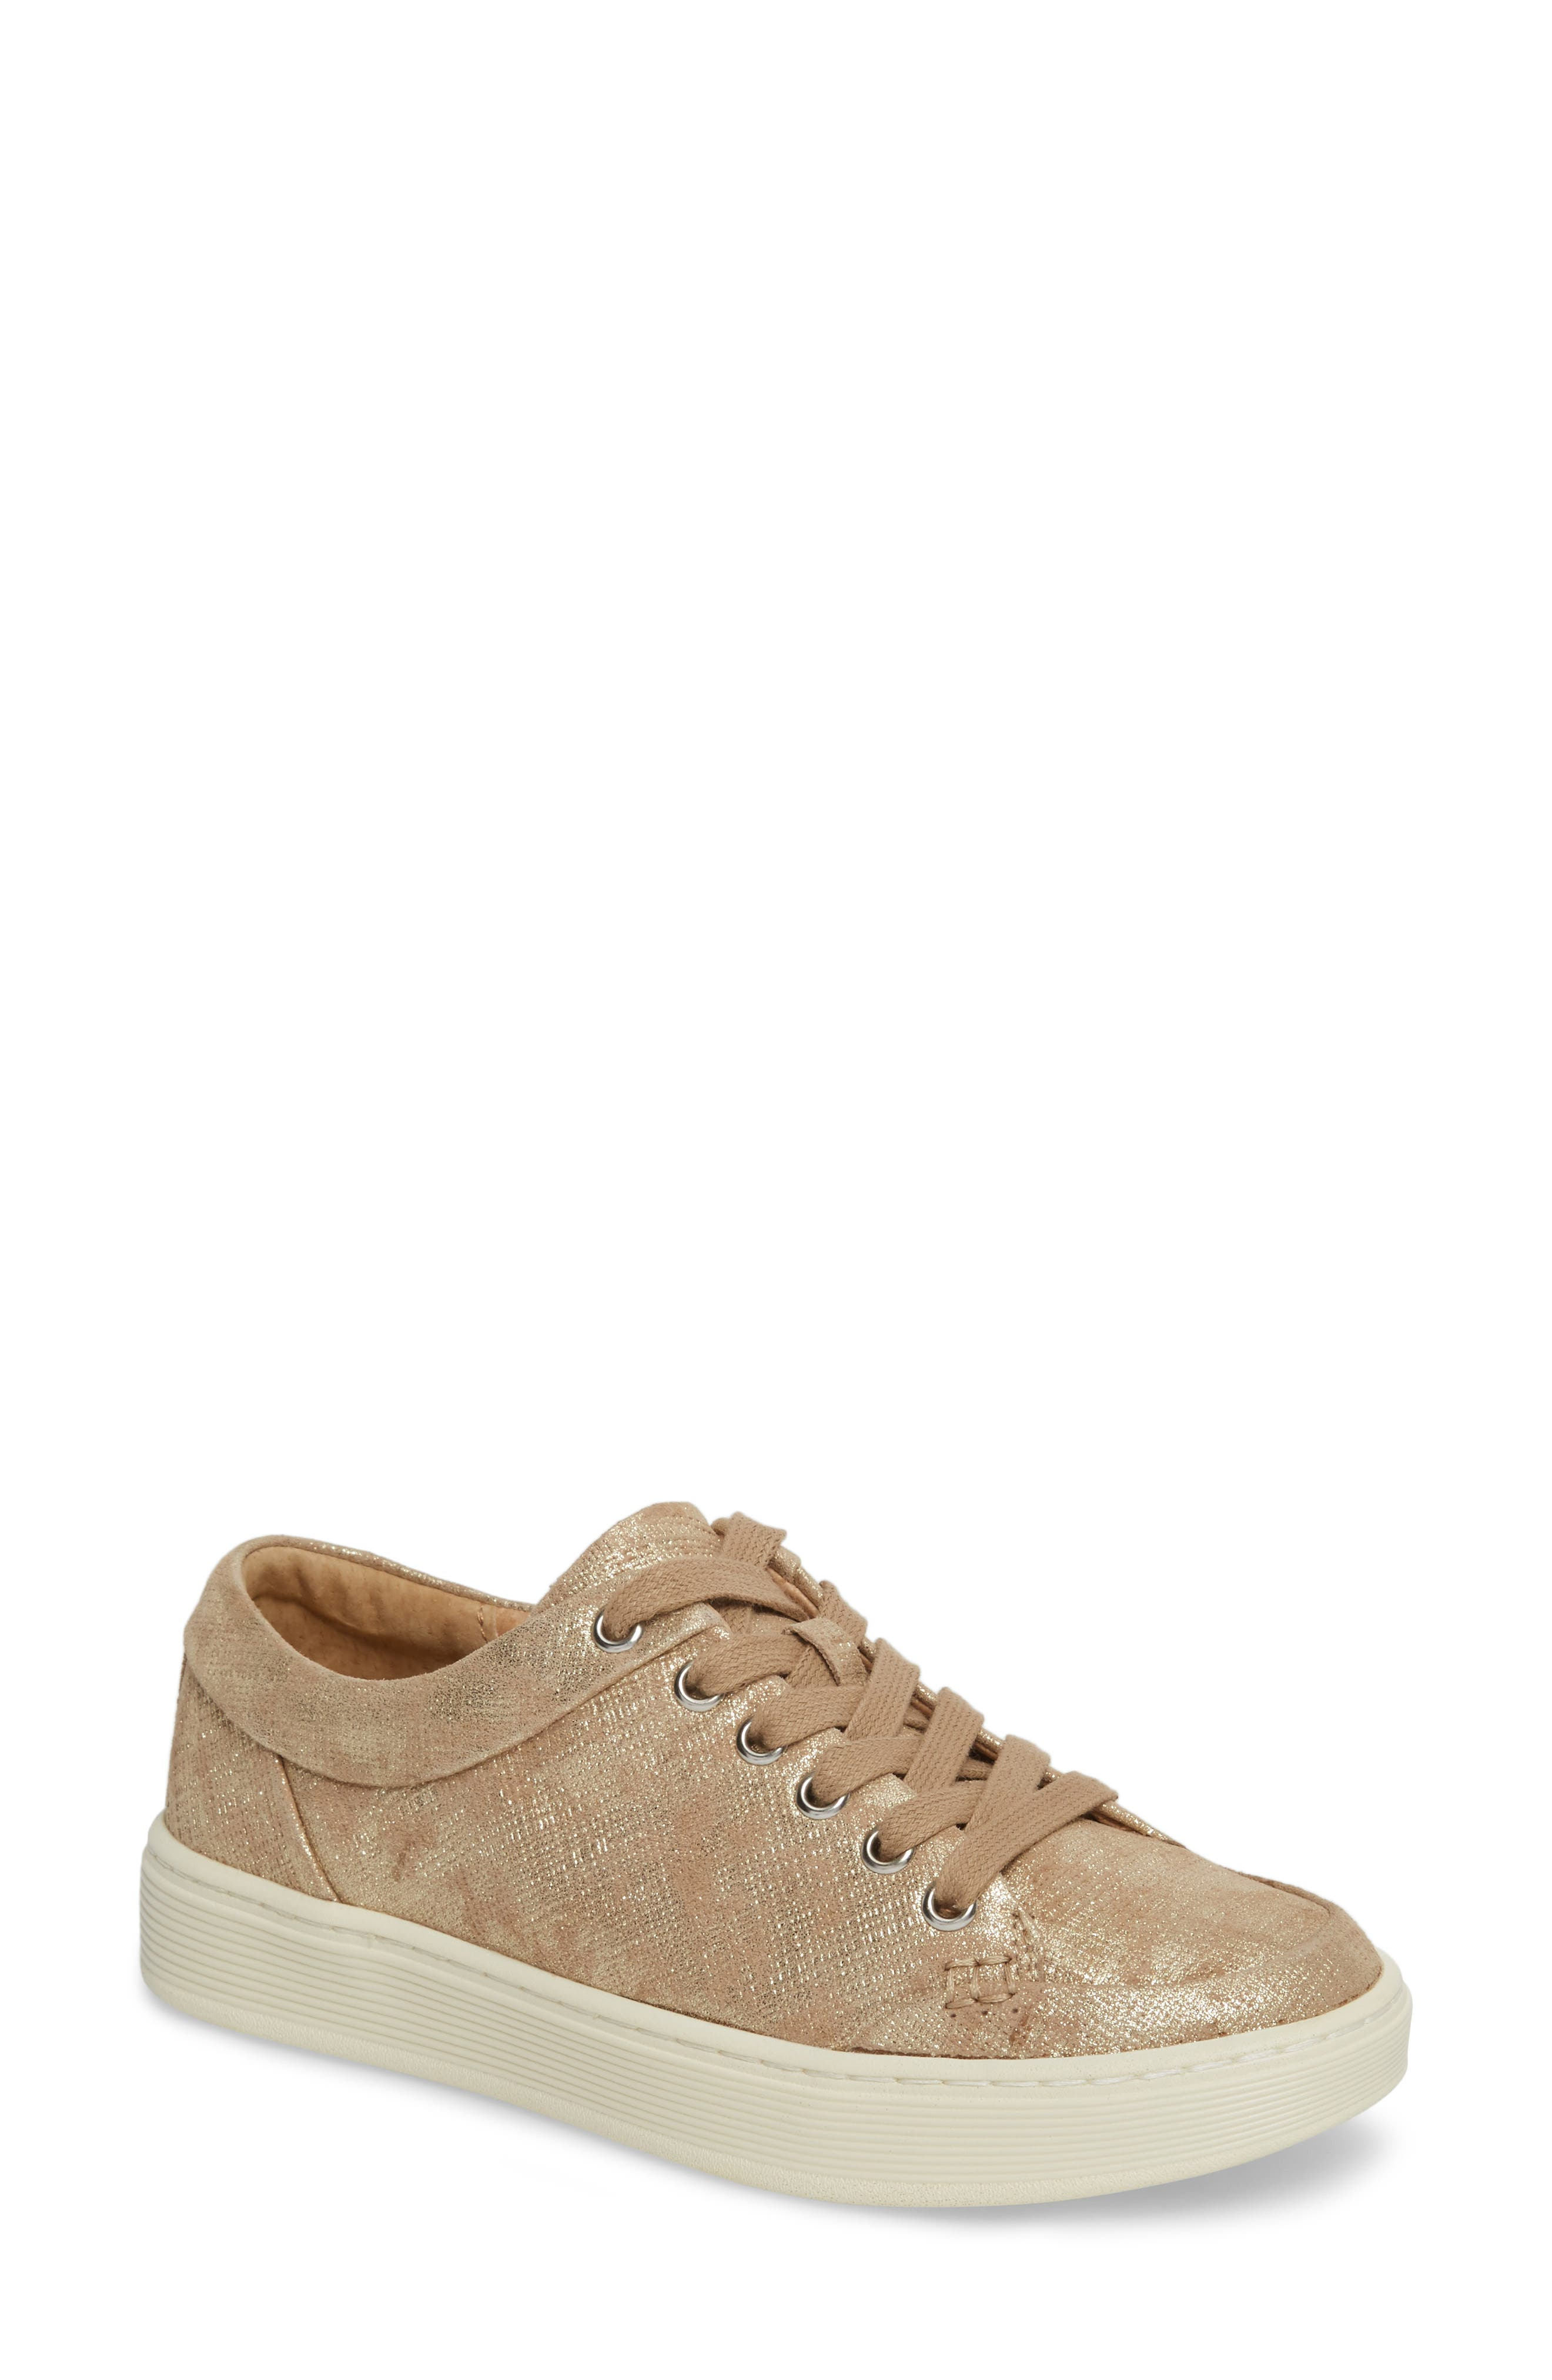 Sanders Sneaker,                             Main thumbnail 1, color,                             Platino Distressed Suede